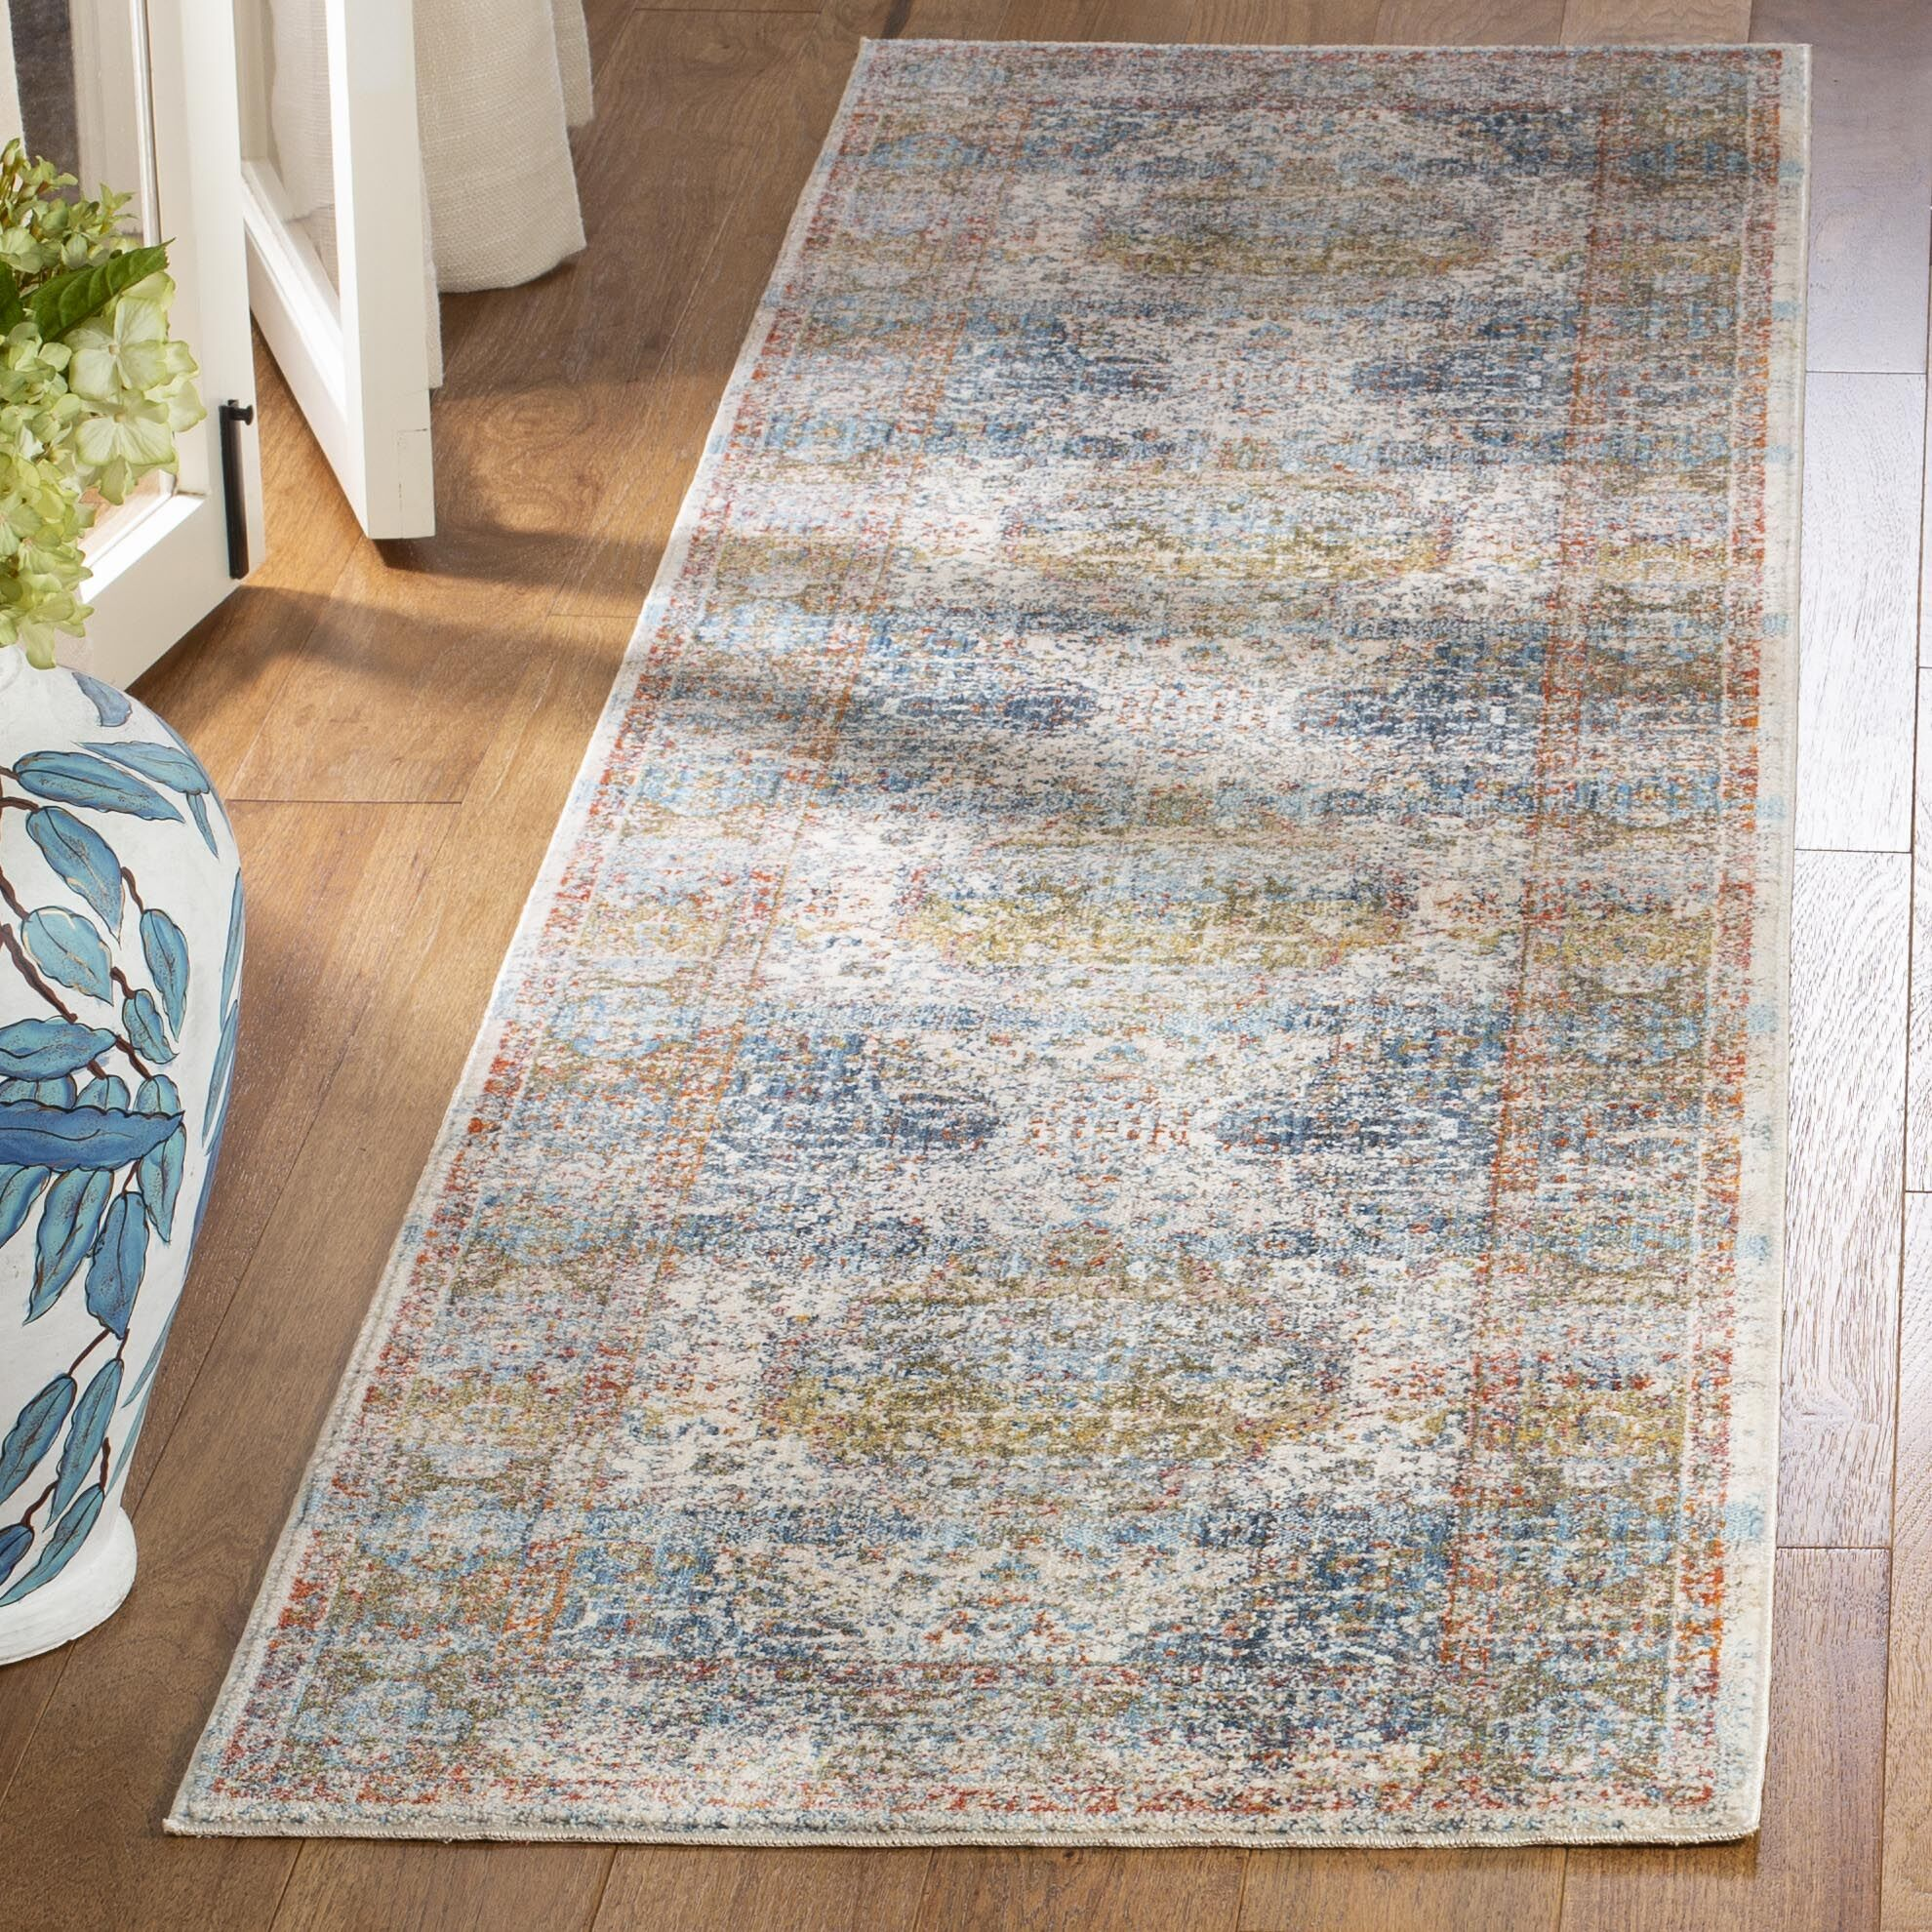 Presswood Vintage Persian Cotton Beige/Blue Area Rug Rug Size: Rectangle 4' X 6'